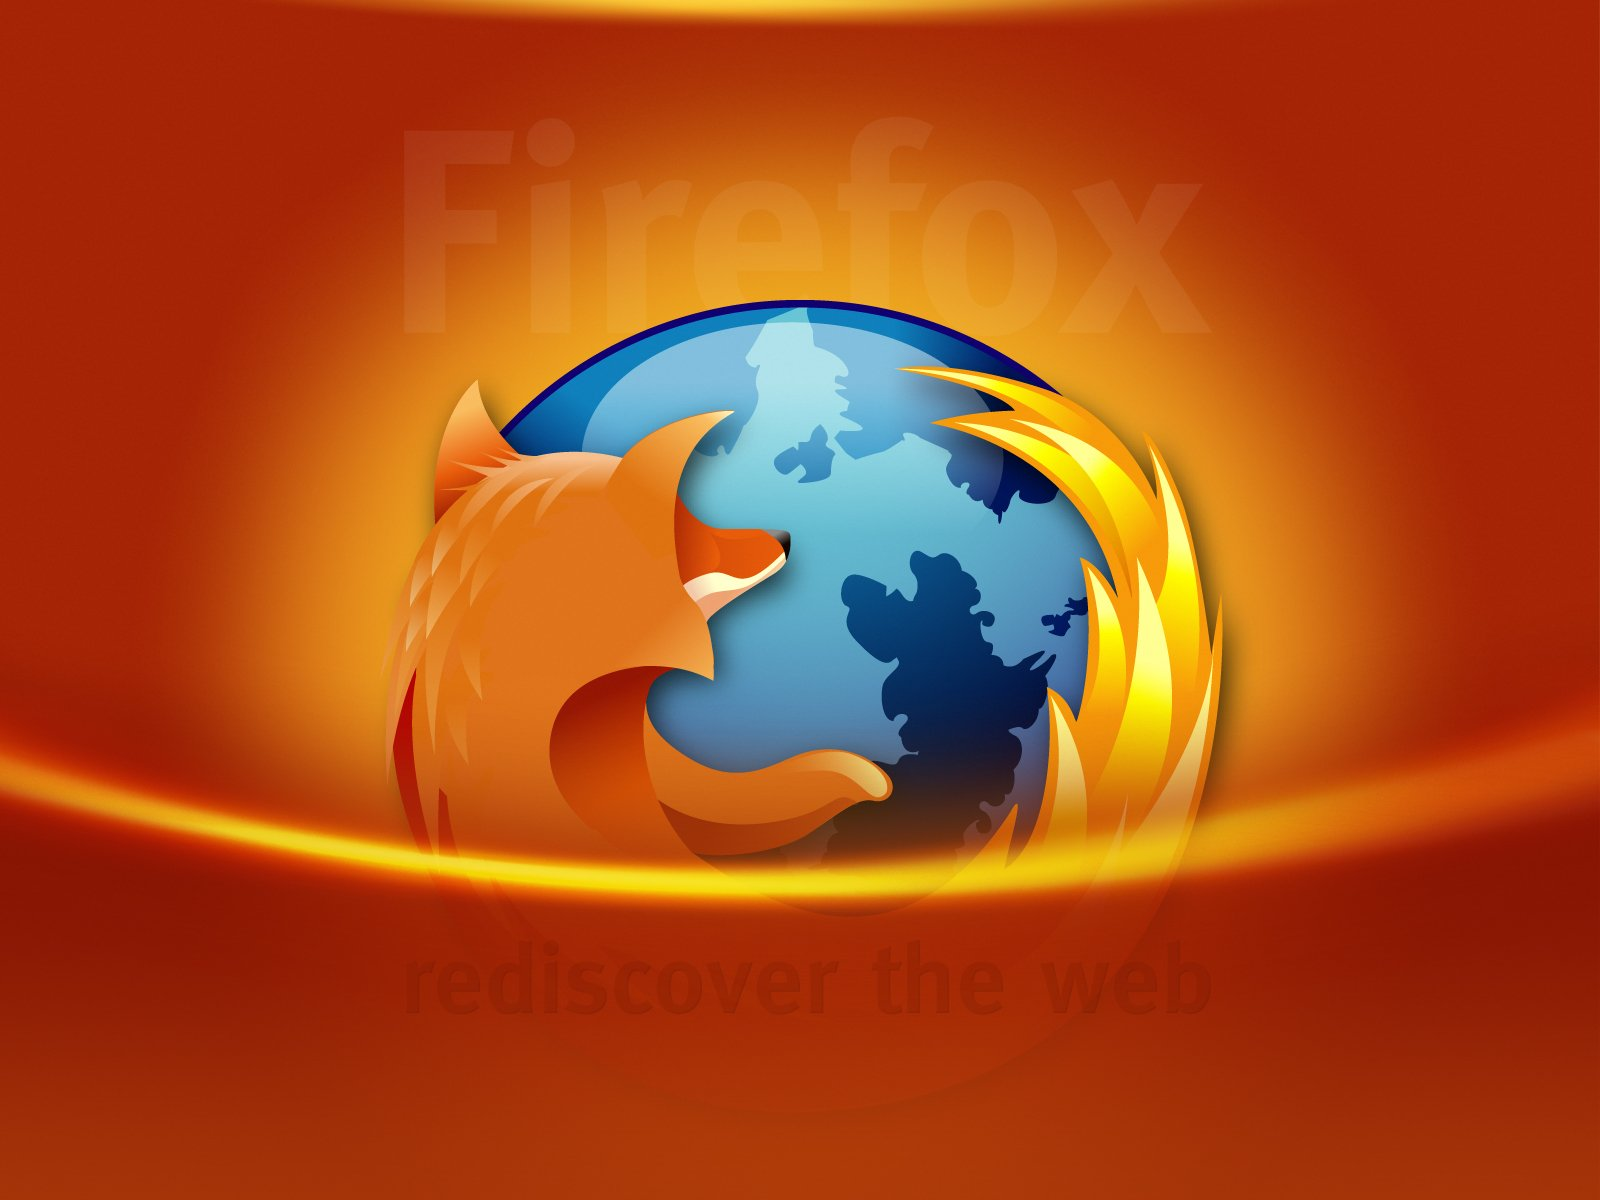 http://3.bp.blogspot.com/_2U3U6AwE-ZQ/TIOnM_xK0oI/AAAAAAAAAWk/Dv9hK9T68zg/s1600/Firefox-wallpaper-001%28www.TheWallpapers.org%29.jpg